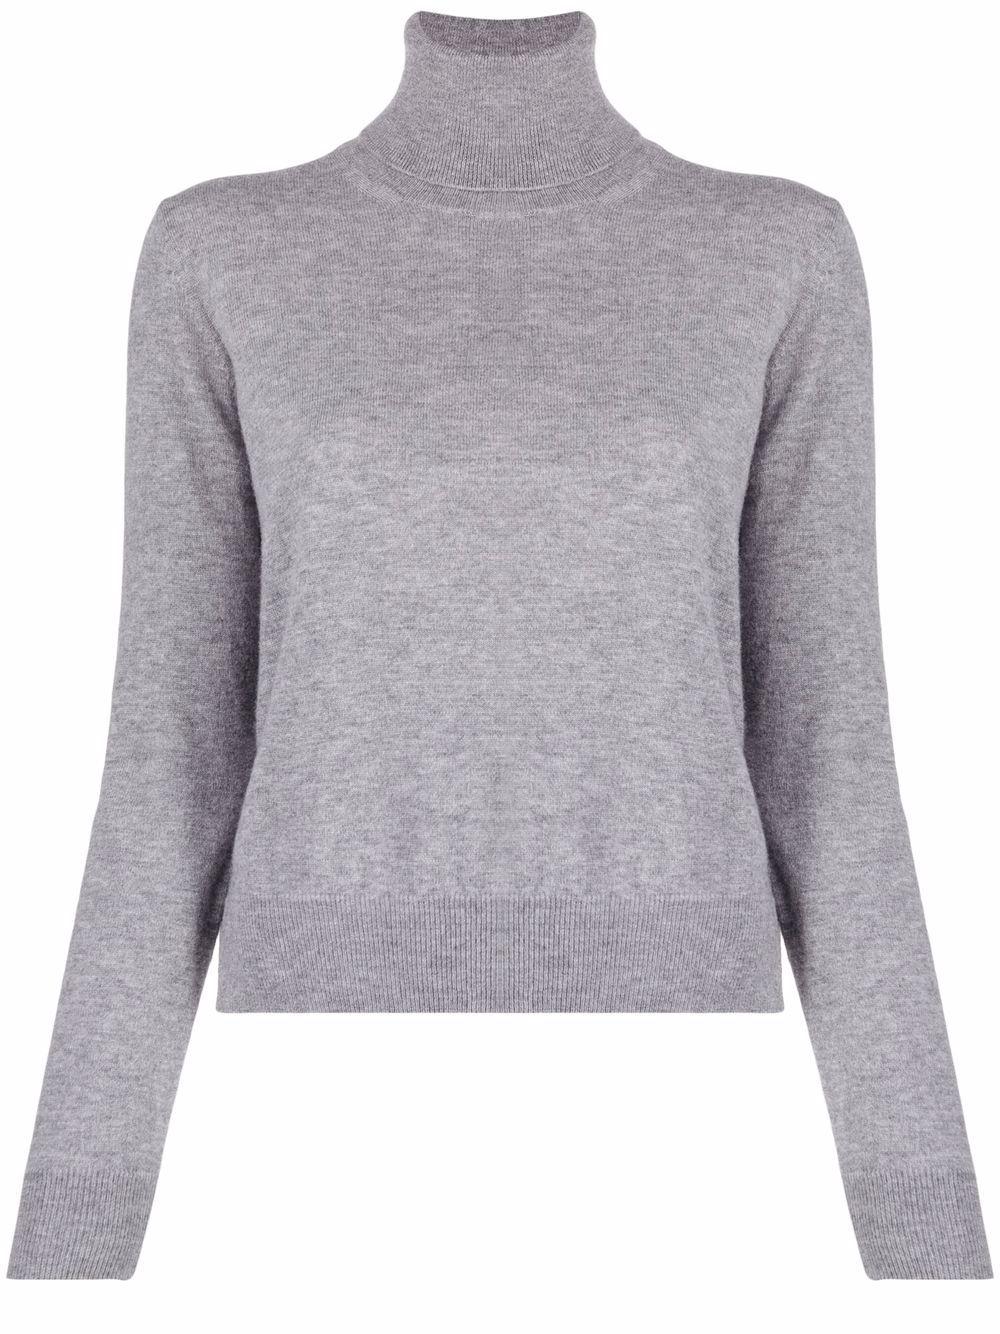 MAISON MARGIELA- Maison Margiela Sweaters Grey- Woman- S - Grey